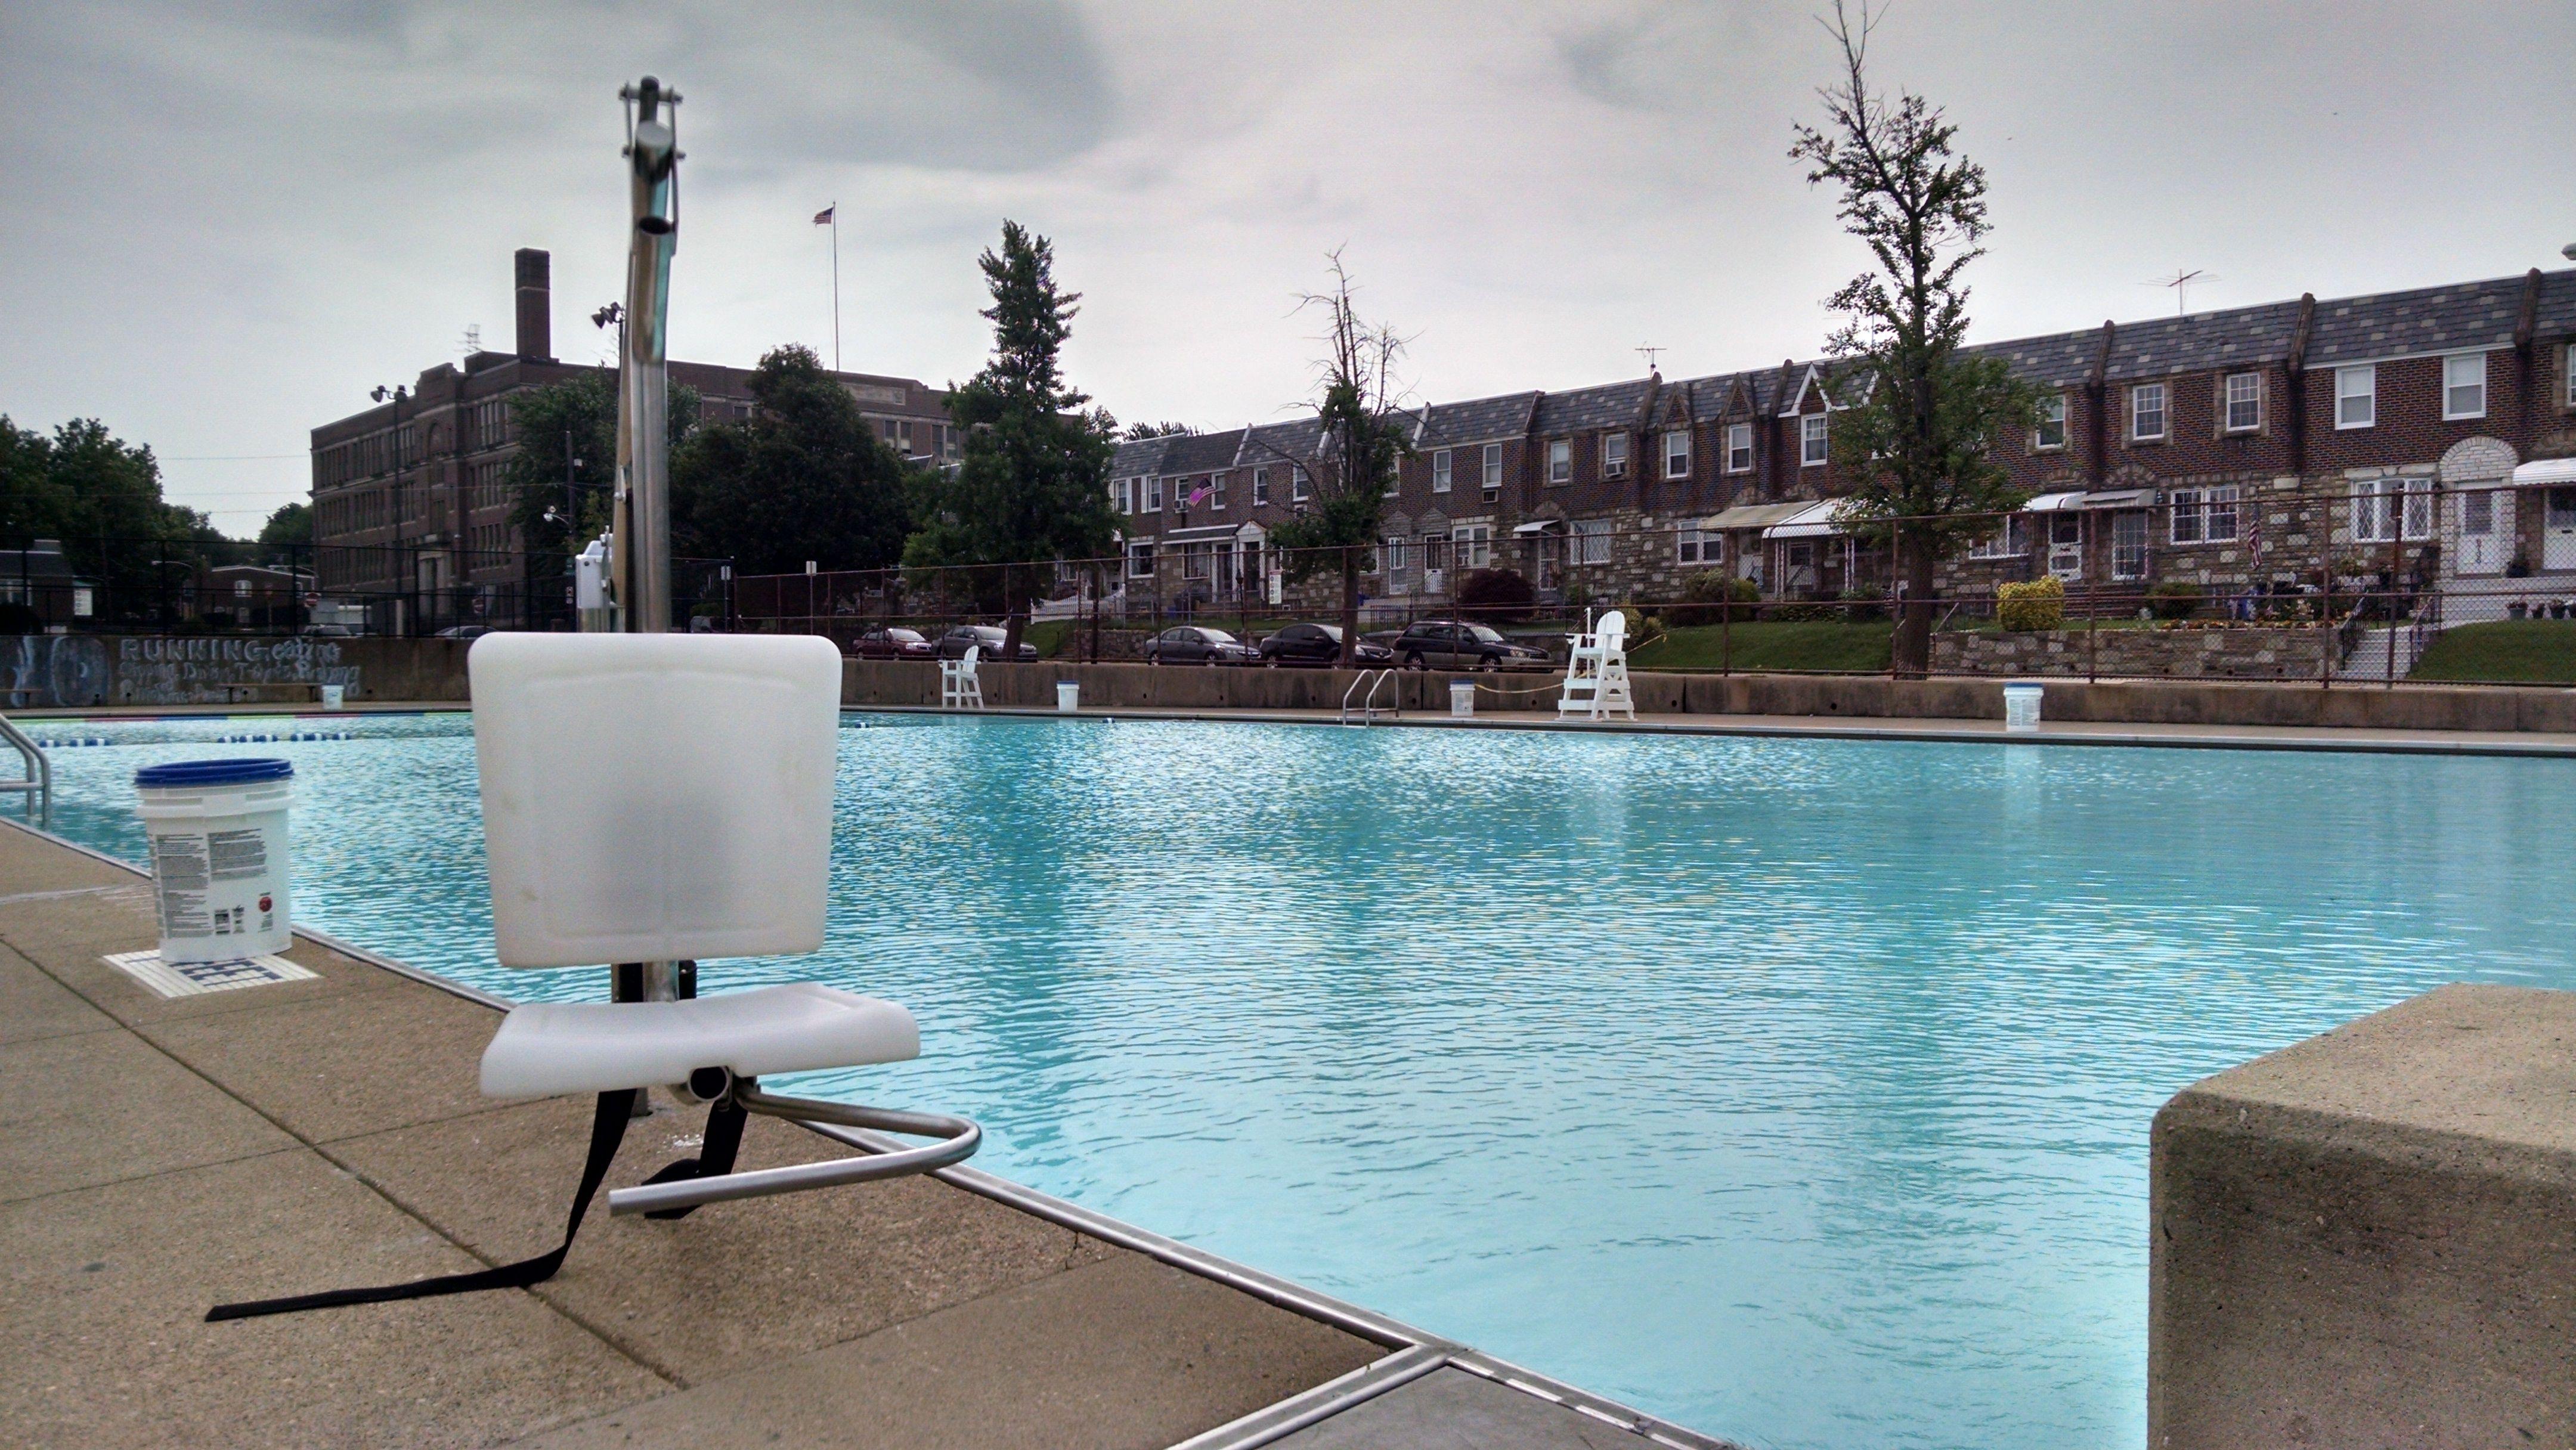 Swimming philadelphia public pools in the city of - Best public swimming pools in massachusetts ...